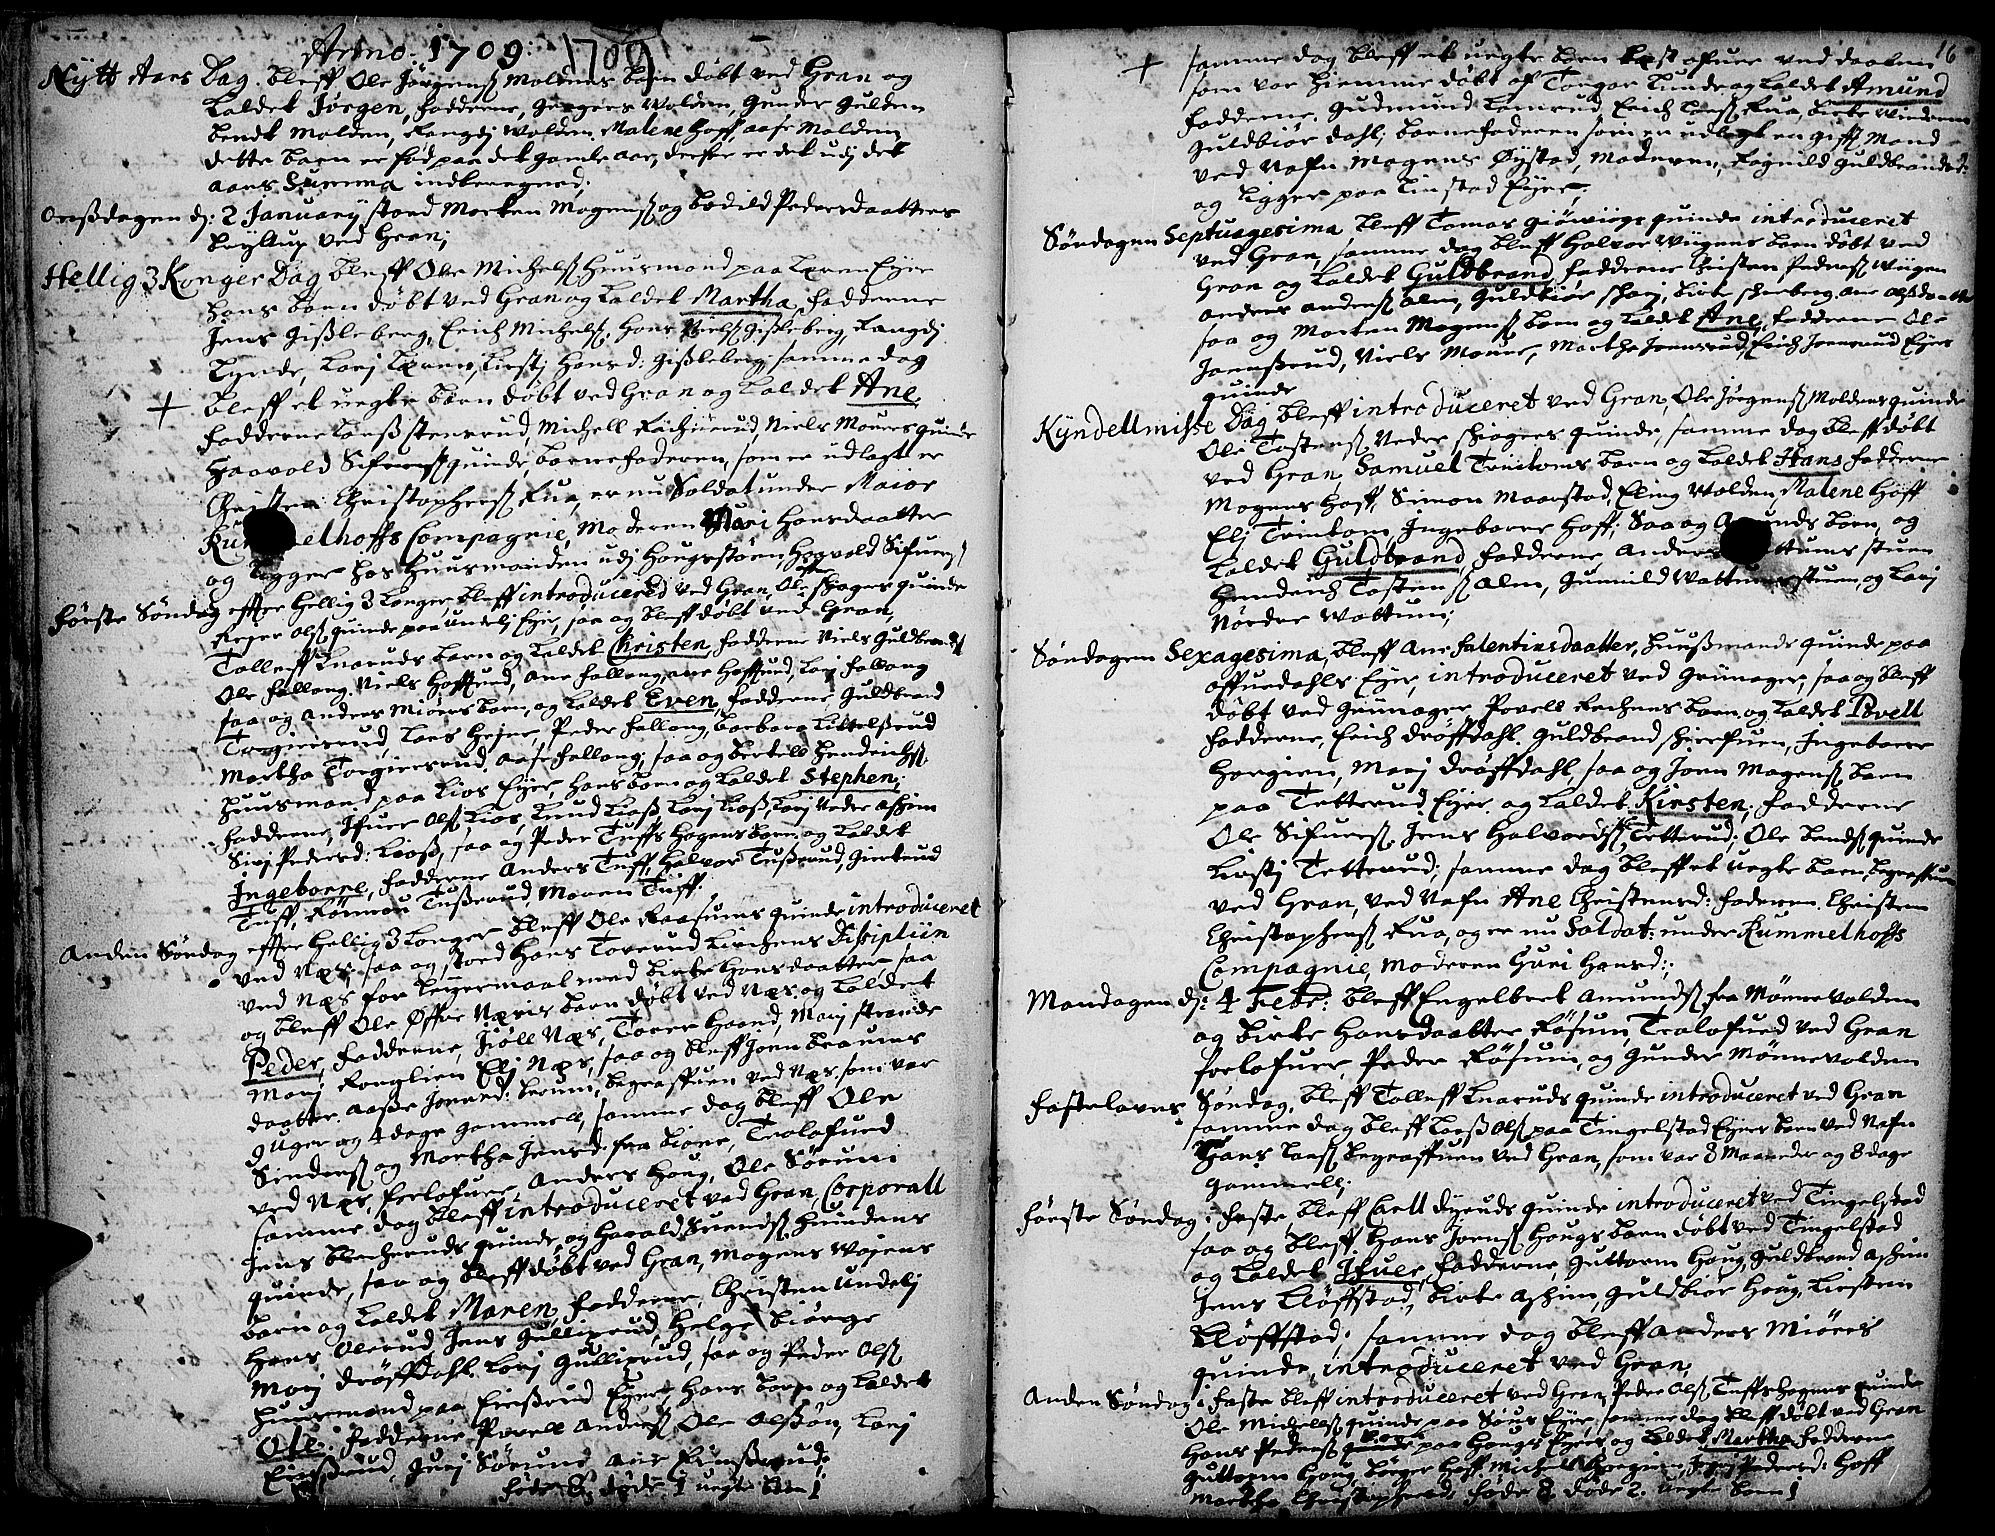 SAH, Gran prestekontor, Ministerialbok nr. 1, 1707-1731, s. 16